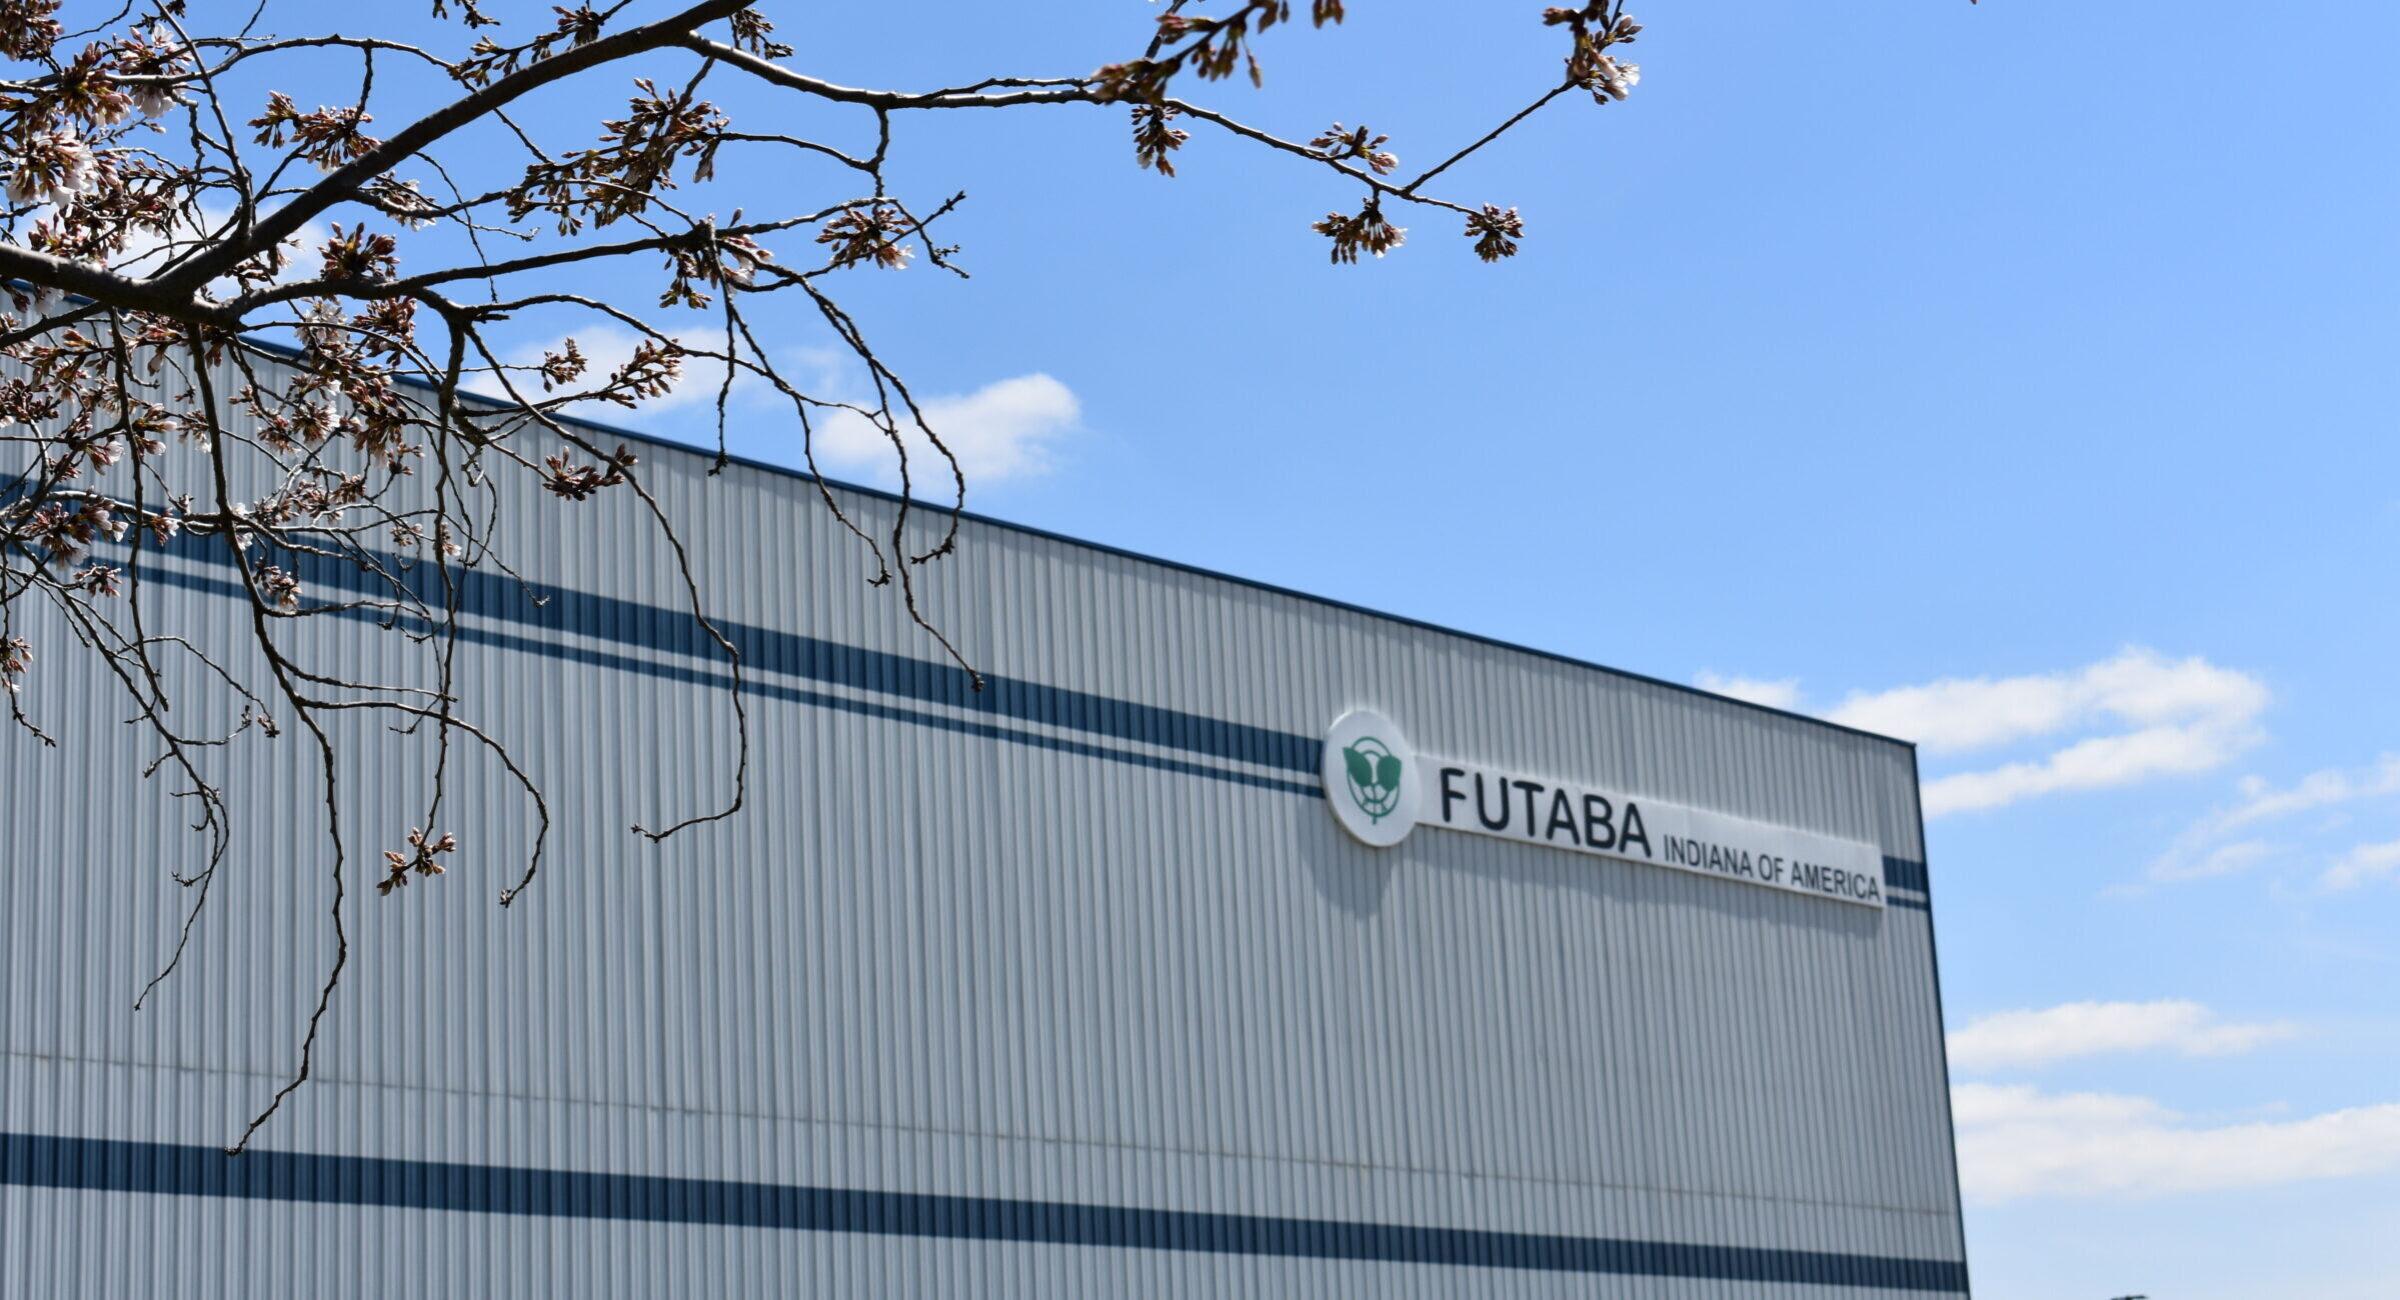 Futaba Indiana of America Corporation